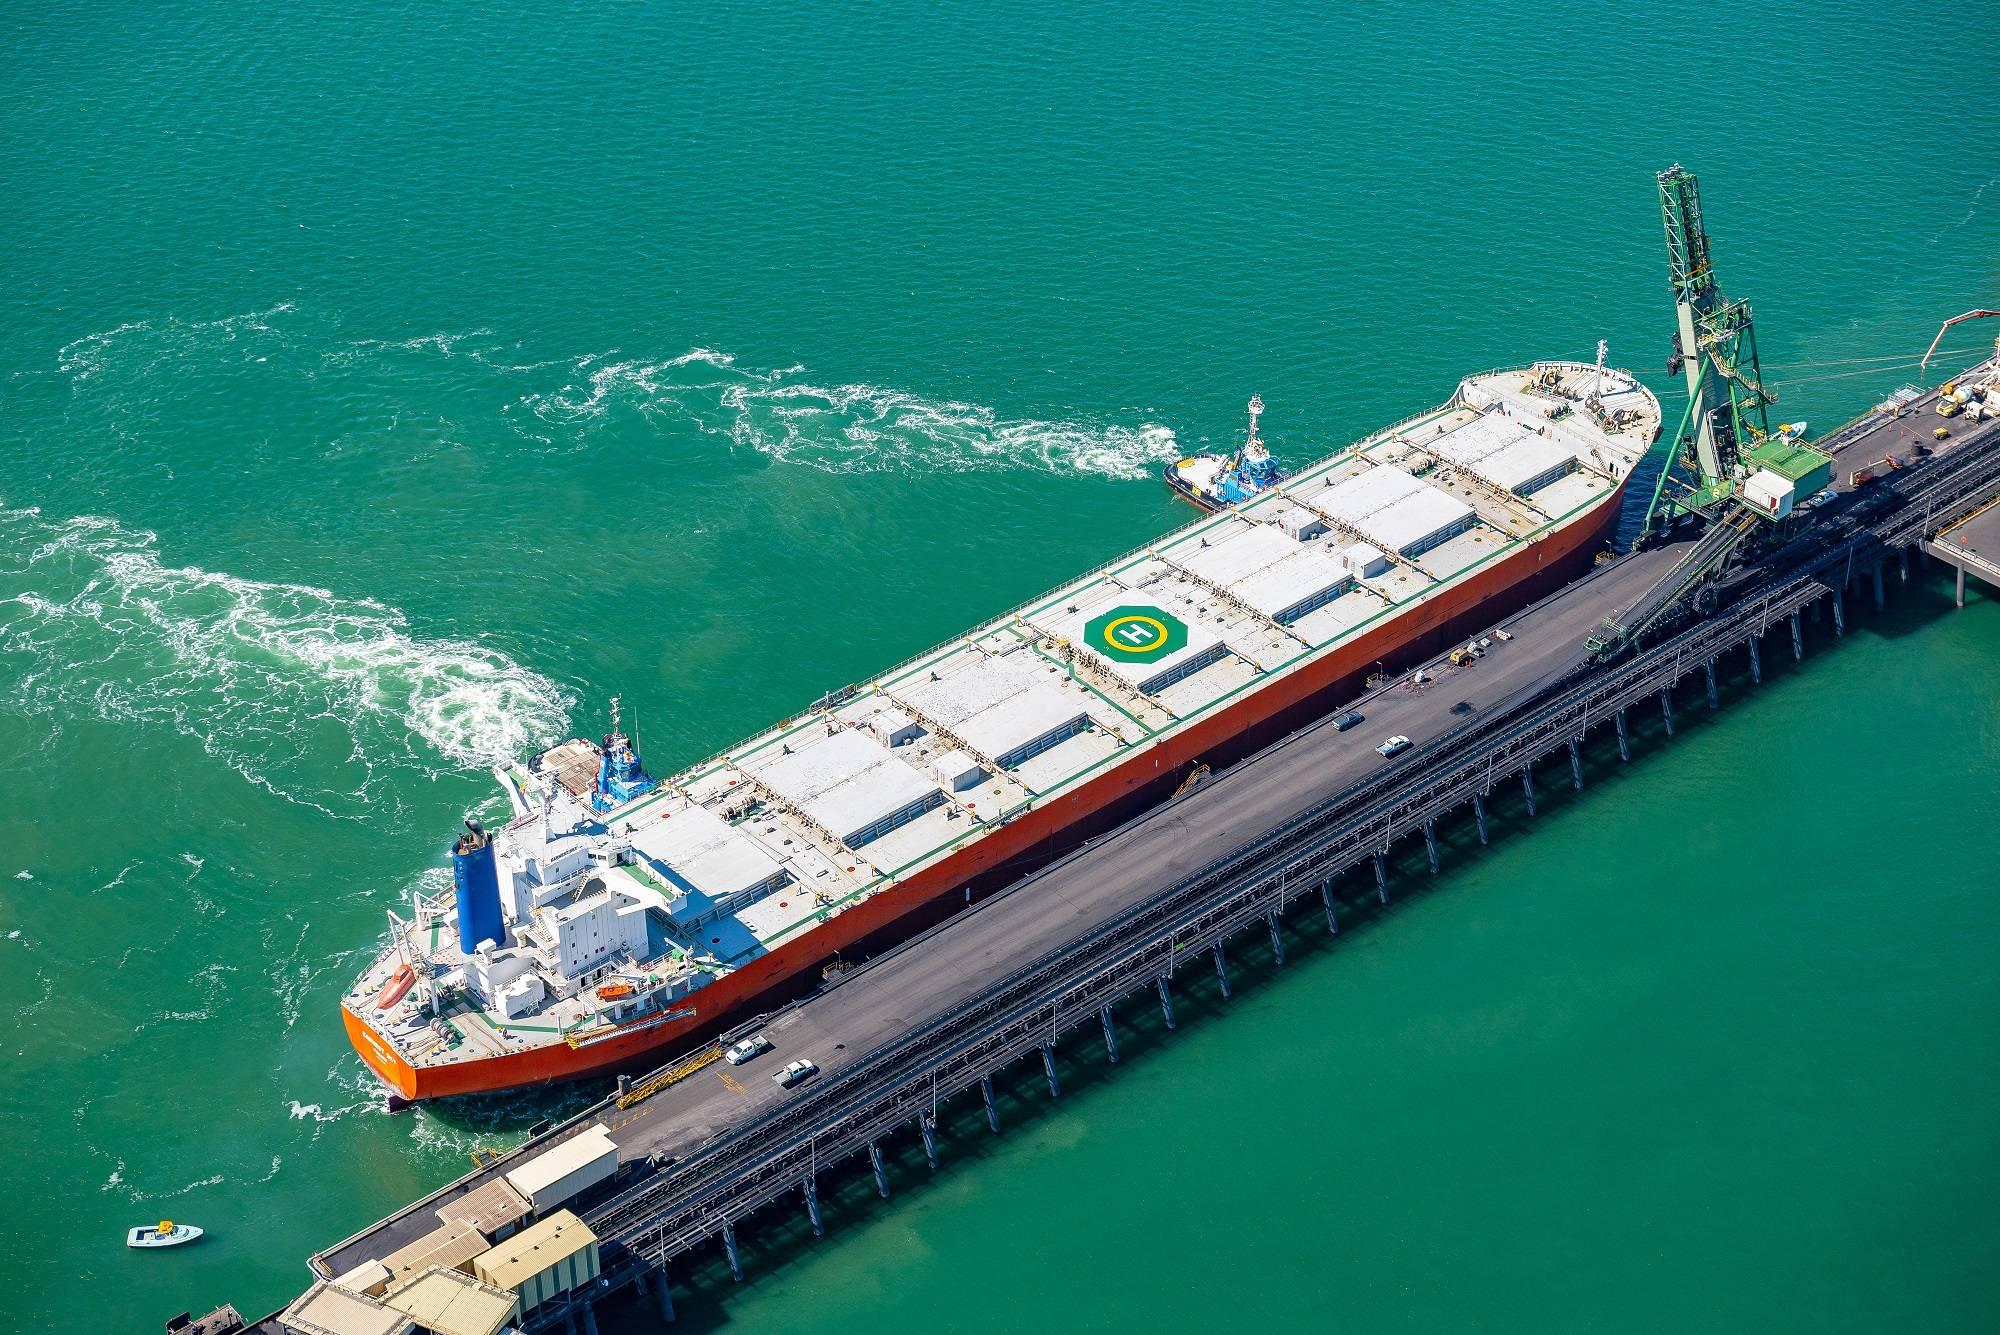 Australia seeks clarity on China coal move